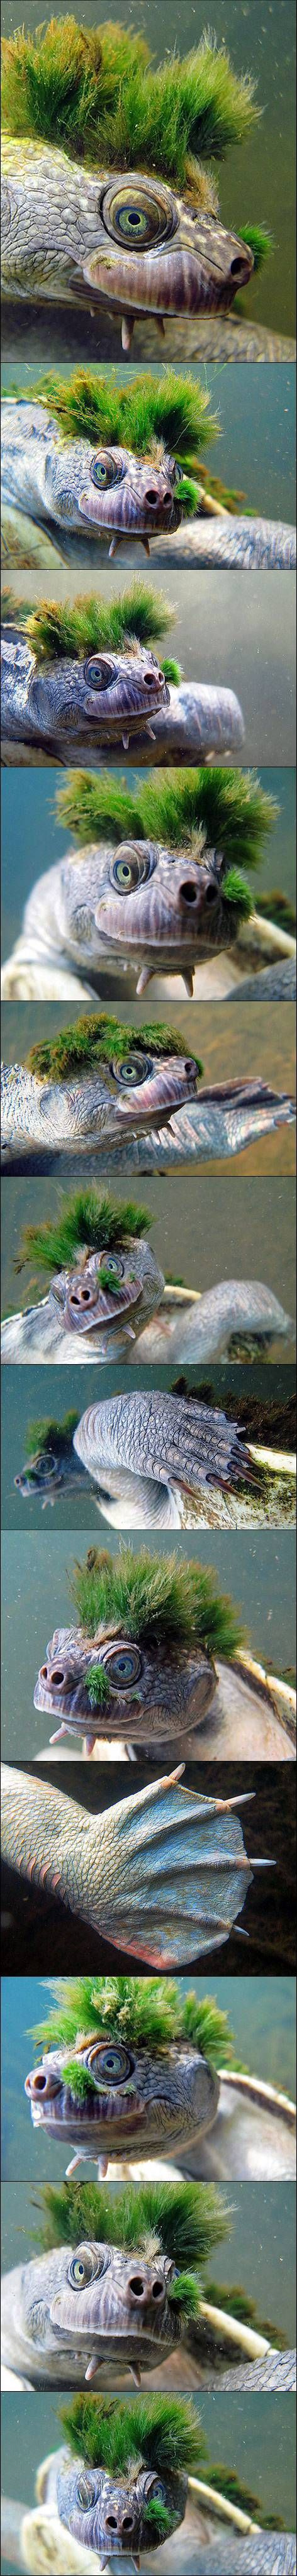 The Mary River turtle (Elusor macrurus) aka the Green Hair Turtle. I love this guy! :-)